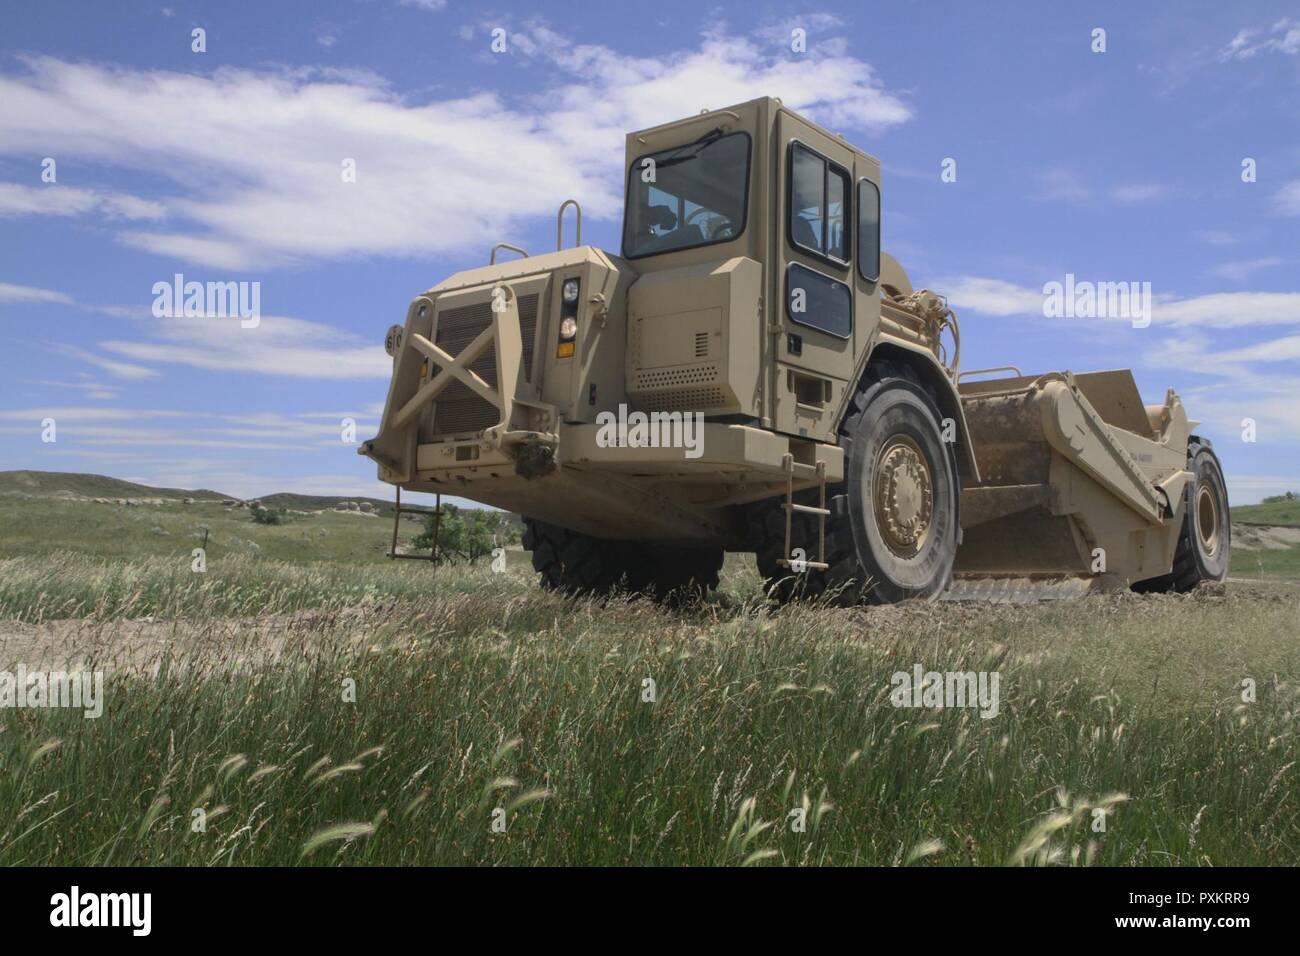 A scraper operator with the South Dakota Army National